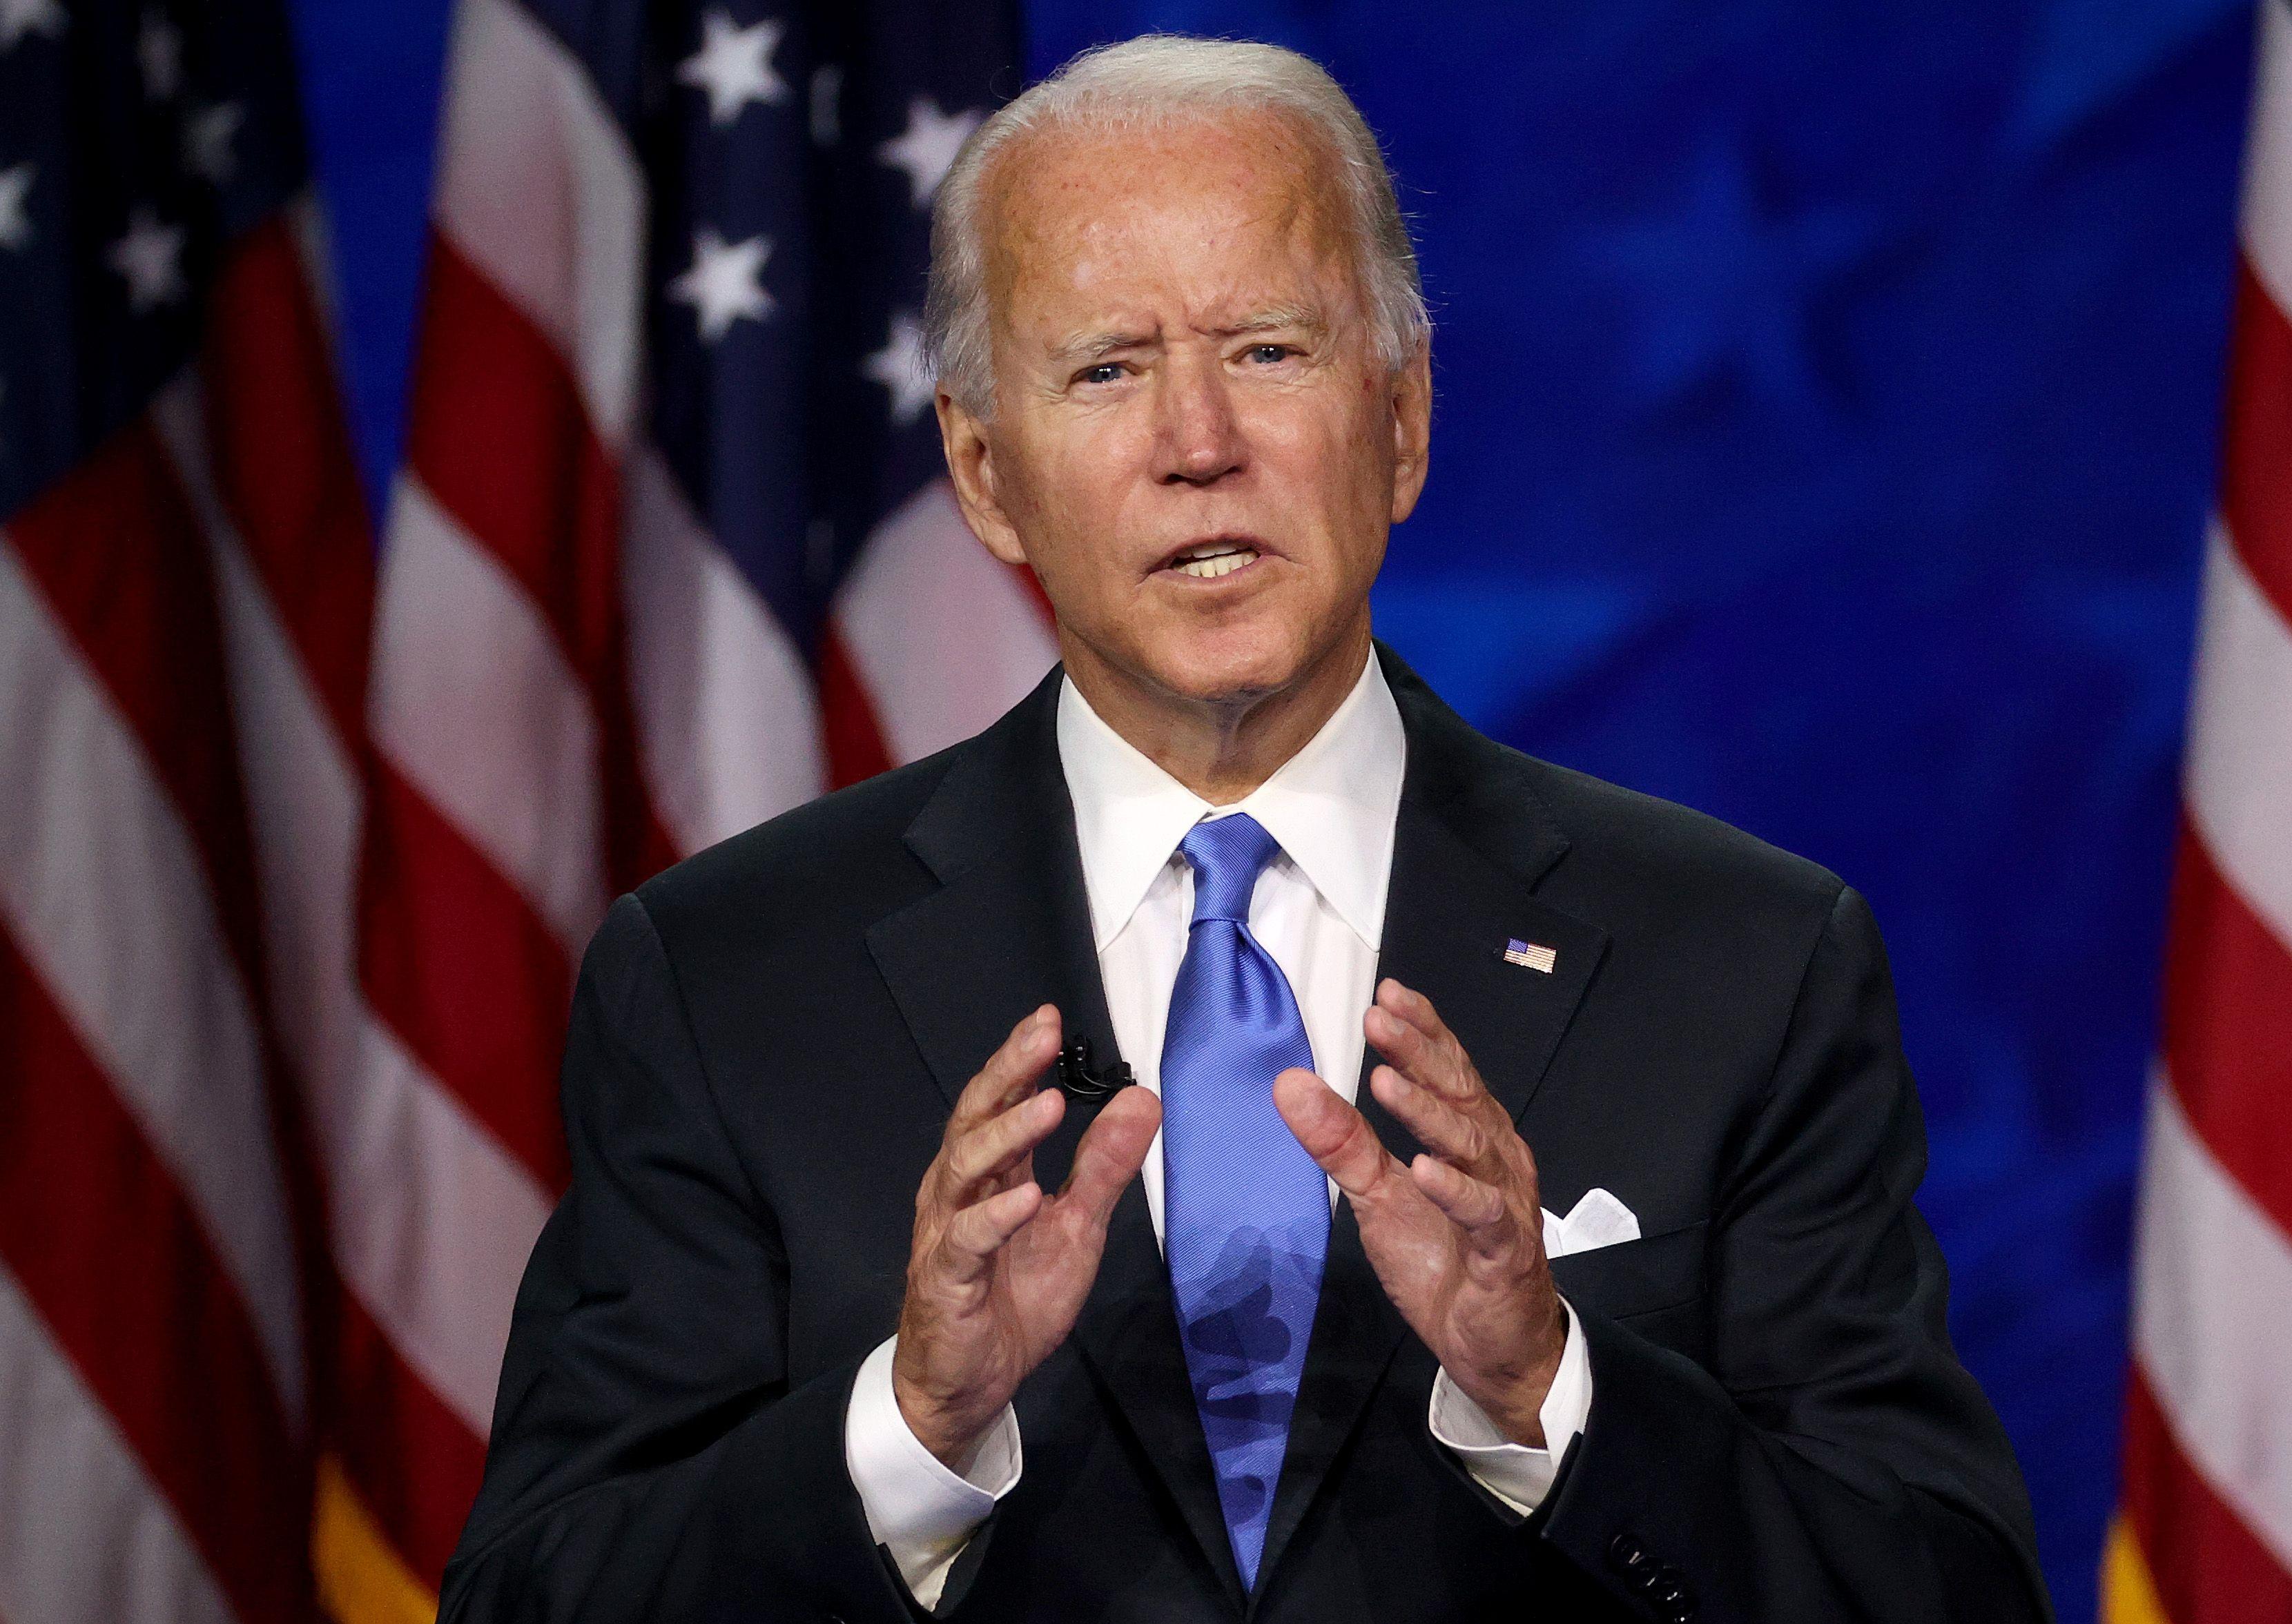 Joe Biden delivers a speech.